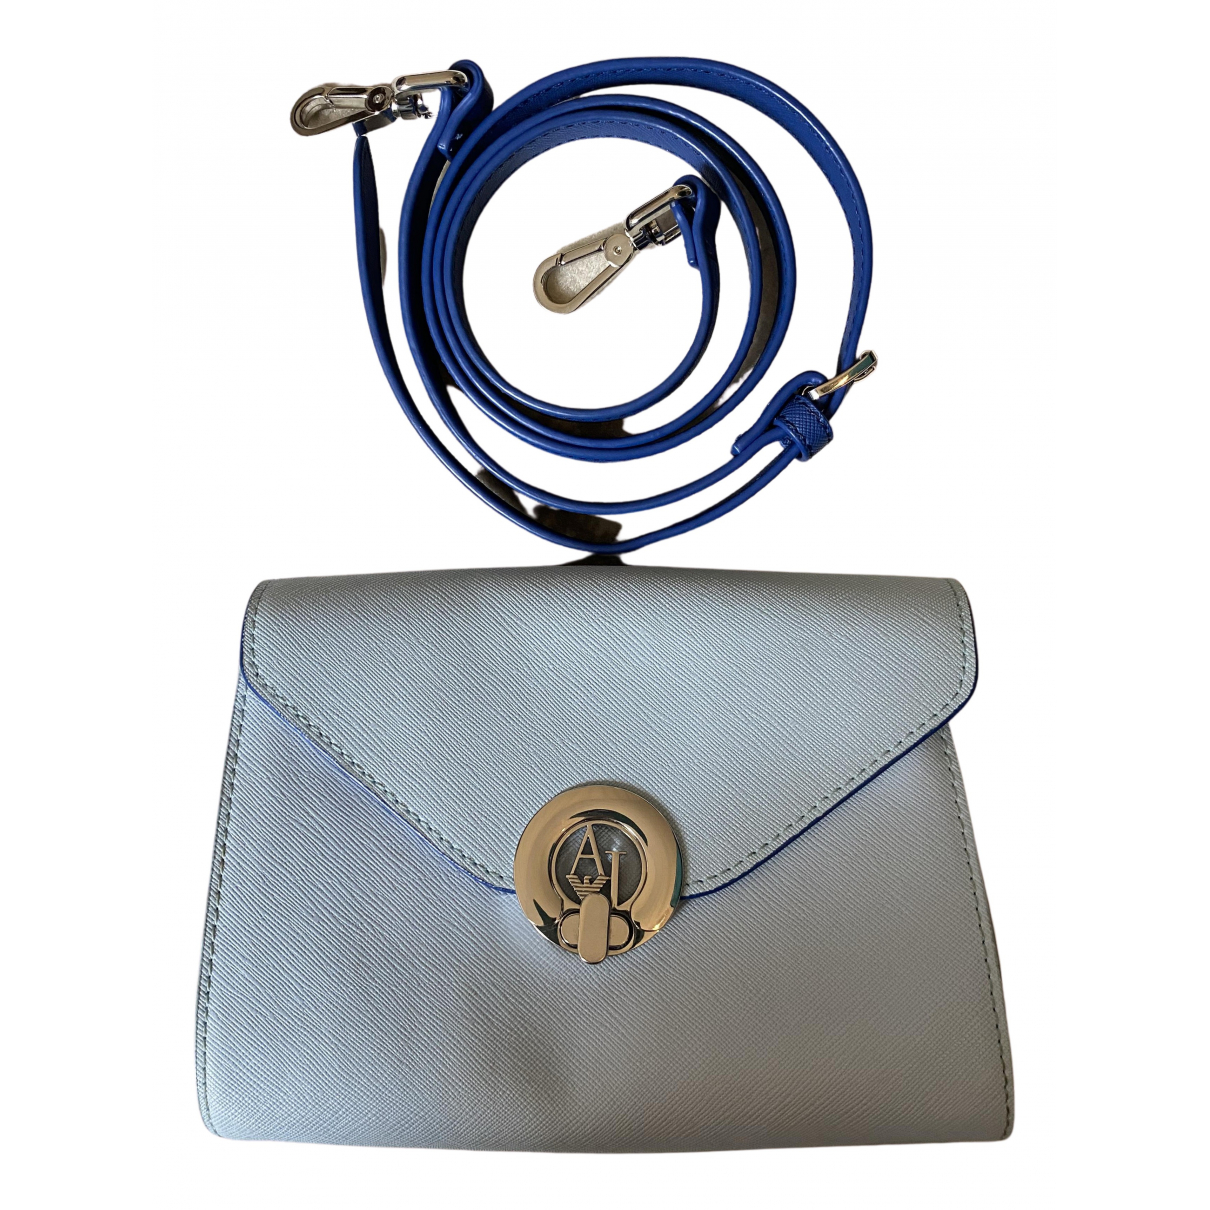 Armani Jeans \N Handtasche in  Blau Leder